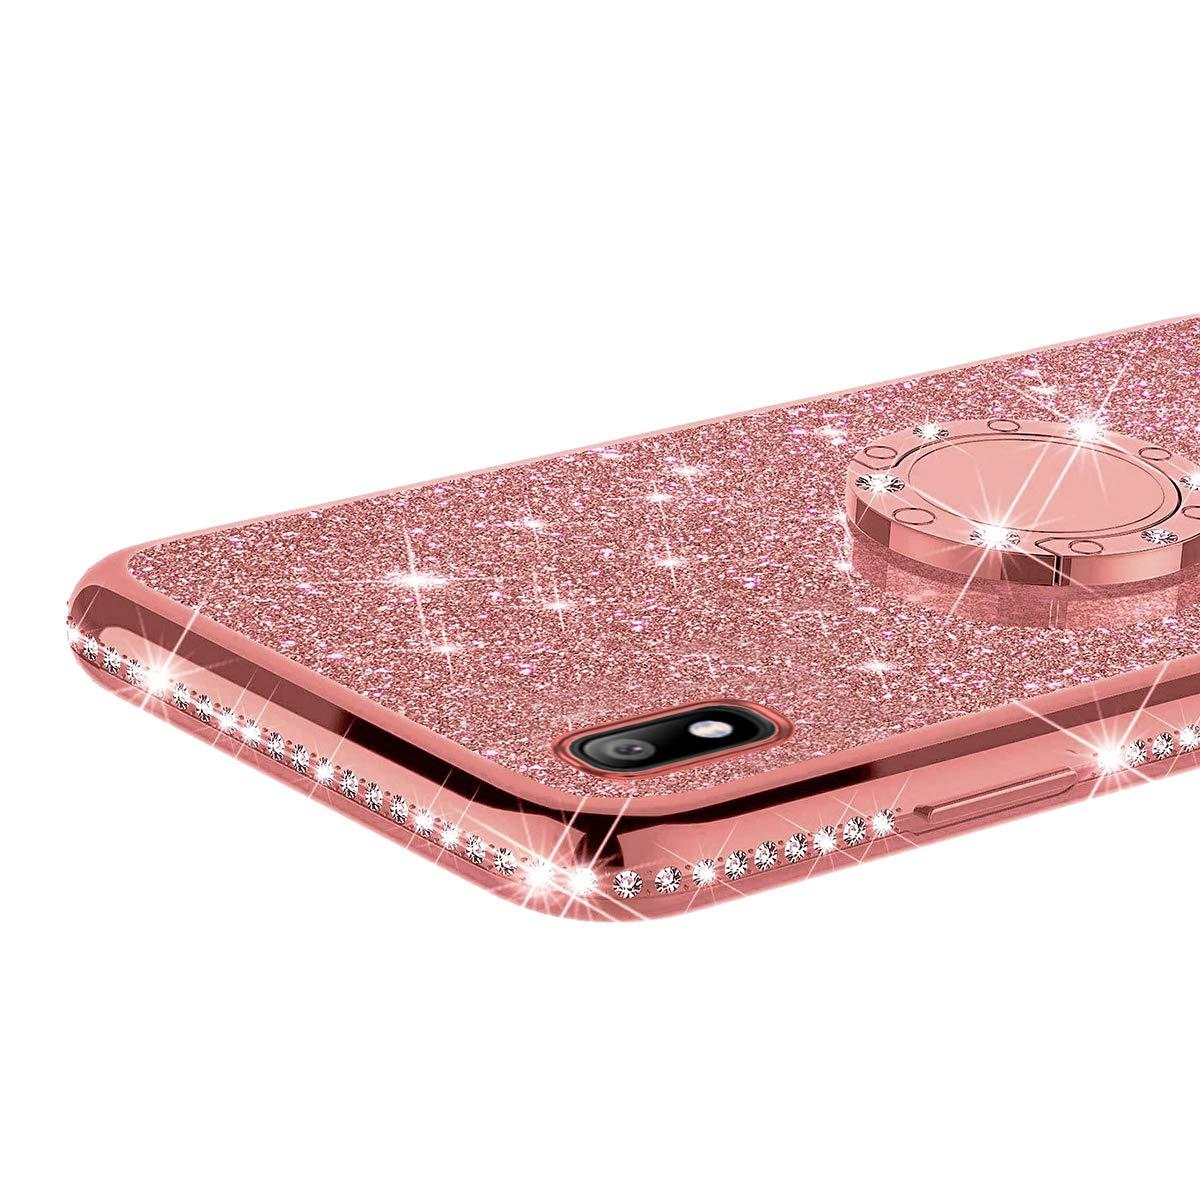 Jinghuash Kompatibel mit Huawei Honor 9 Lite H/ülle Glitzer Kristall Gl/änzend Strass Diamant Silikon Schutzh/ülle Ultra D/ünn Crystal Clear TPU Silikon Handyh/ülle Tasche Case-Silber